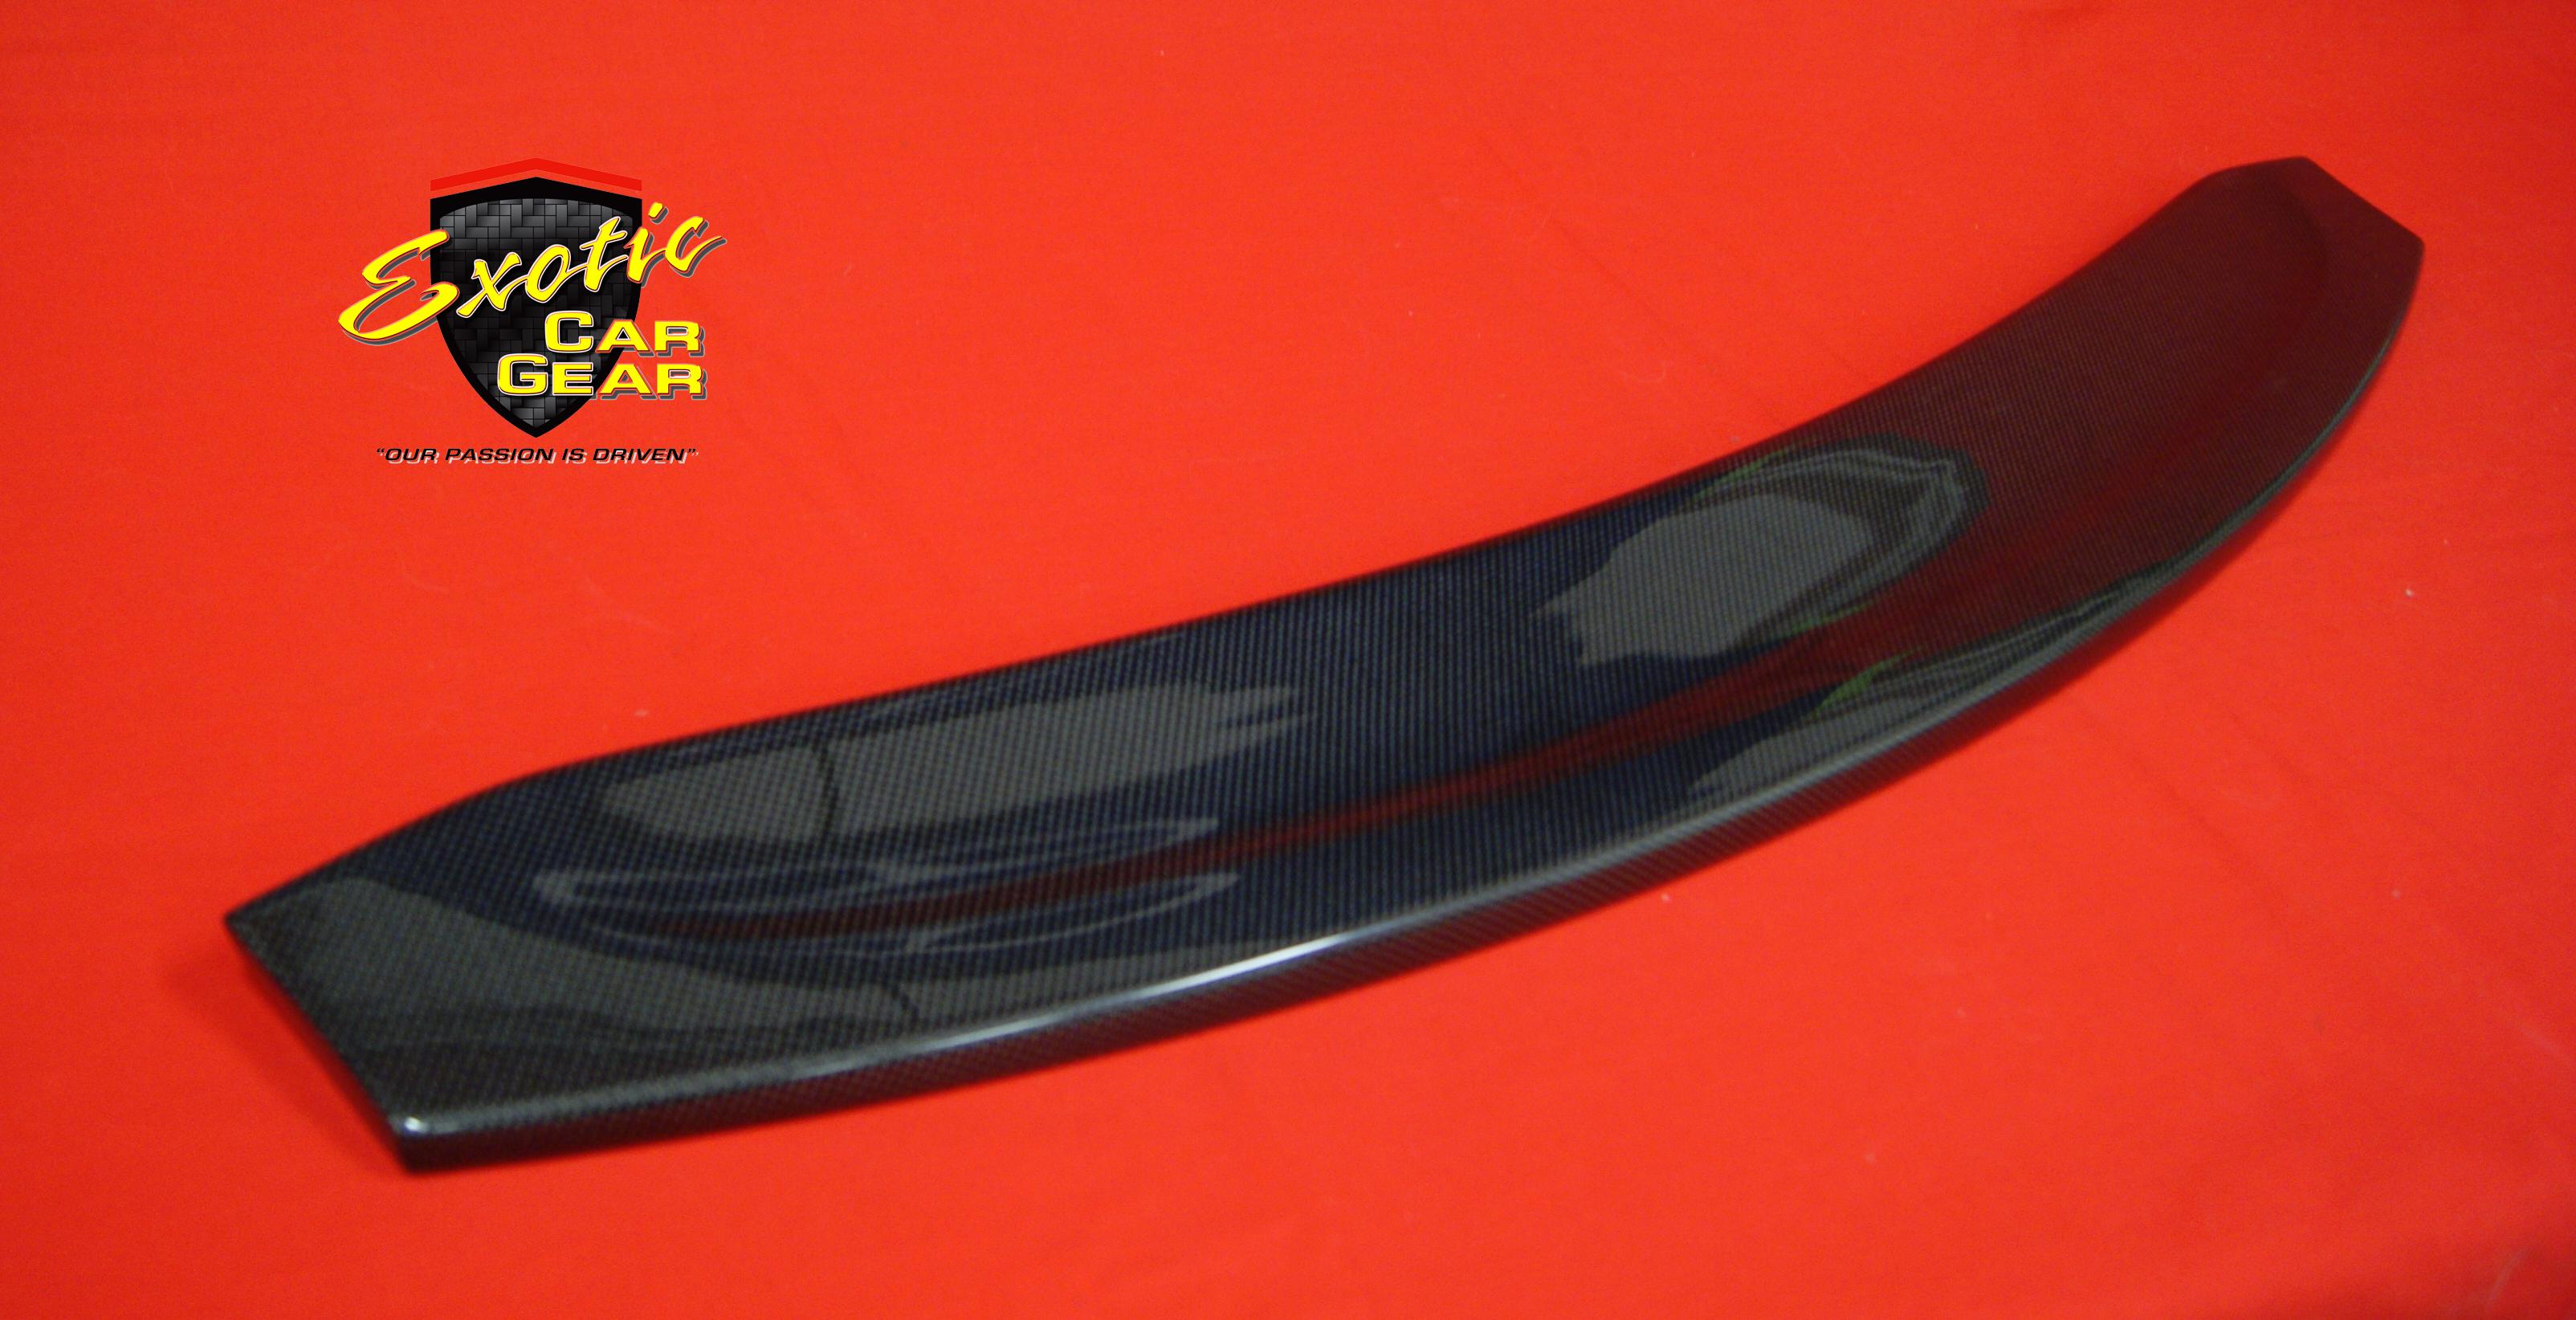 Carbon Fiber Rear Spoiler Oem Exotic Car Gear Inc